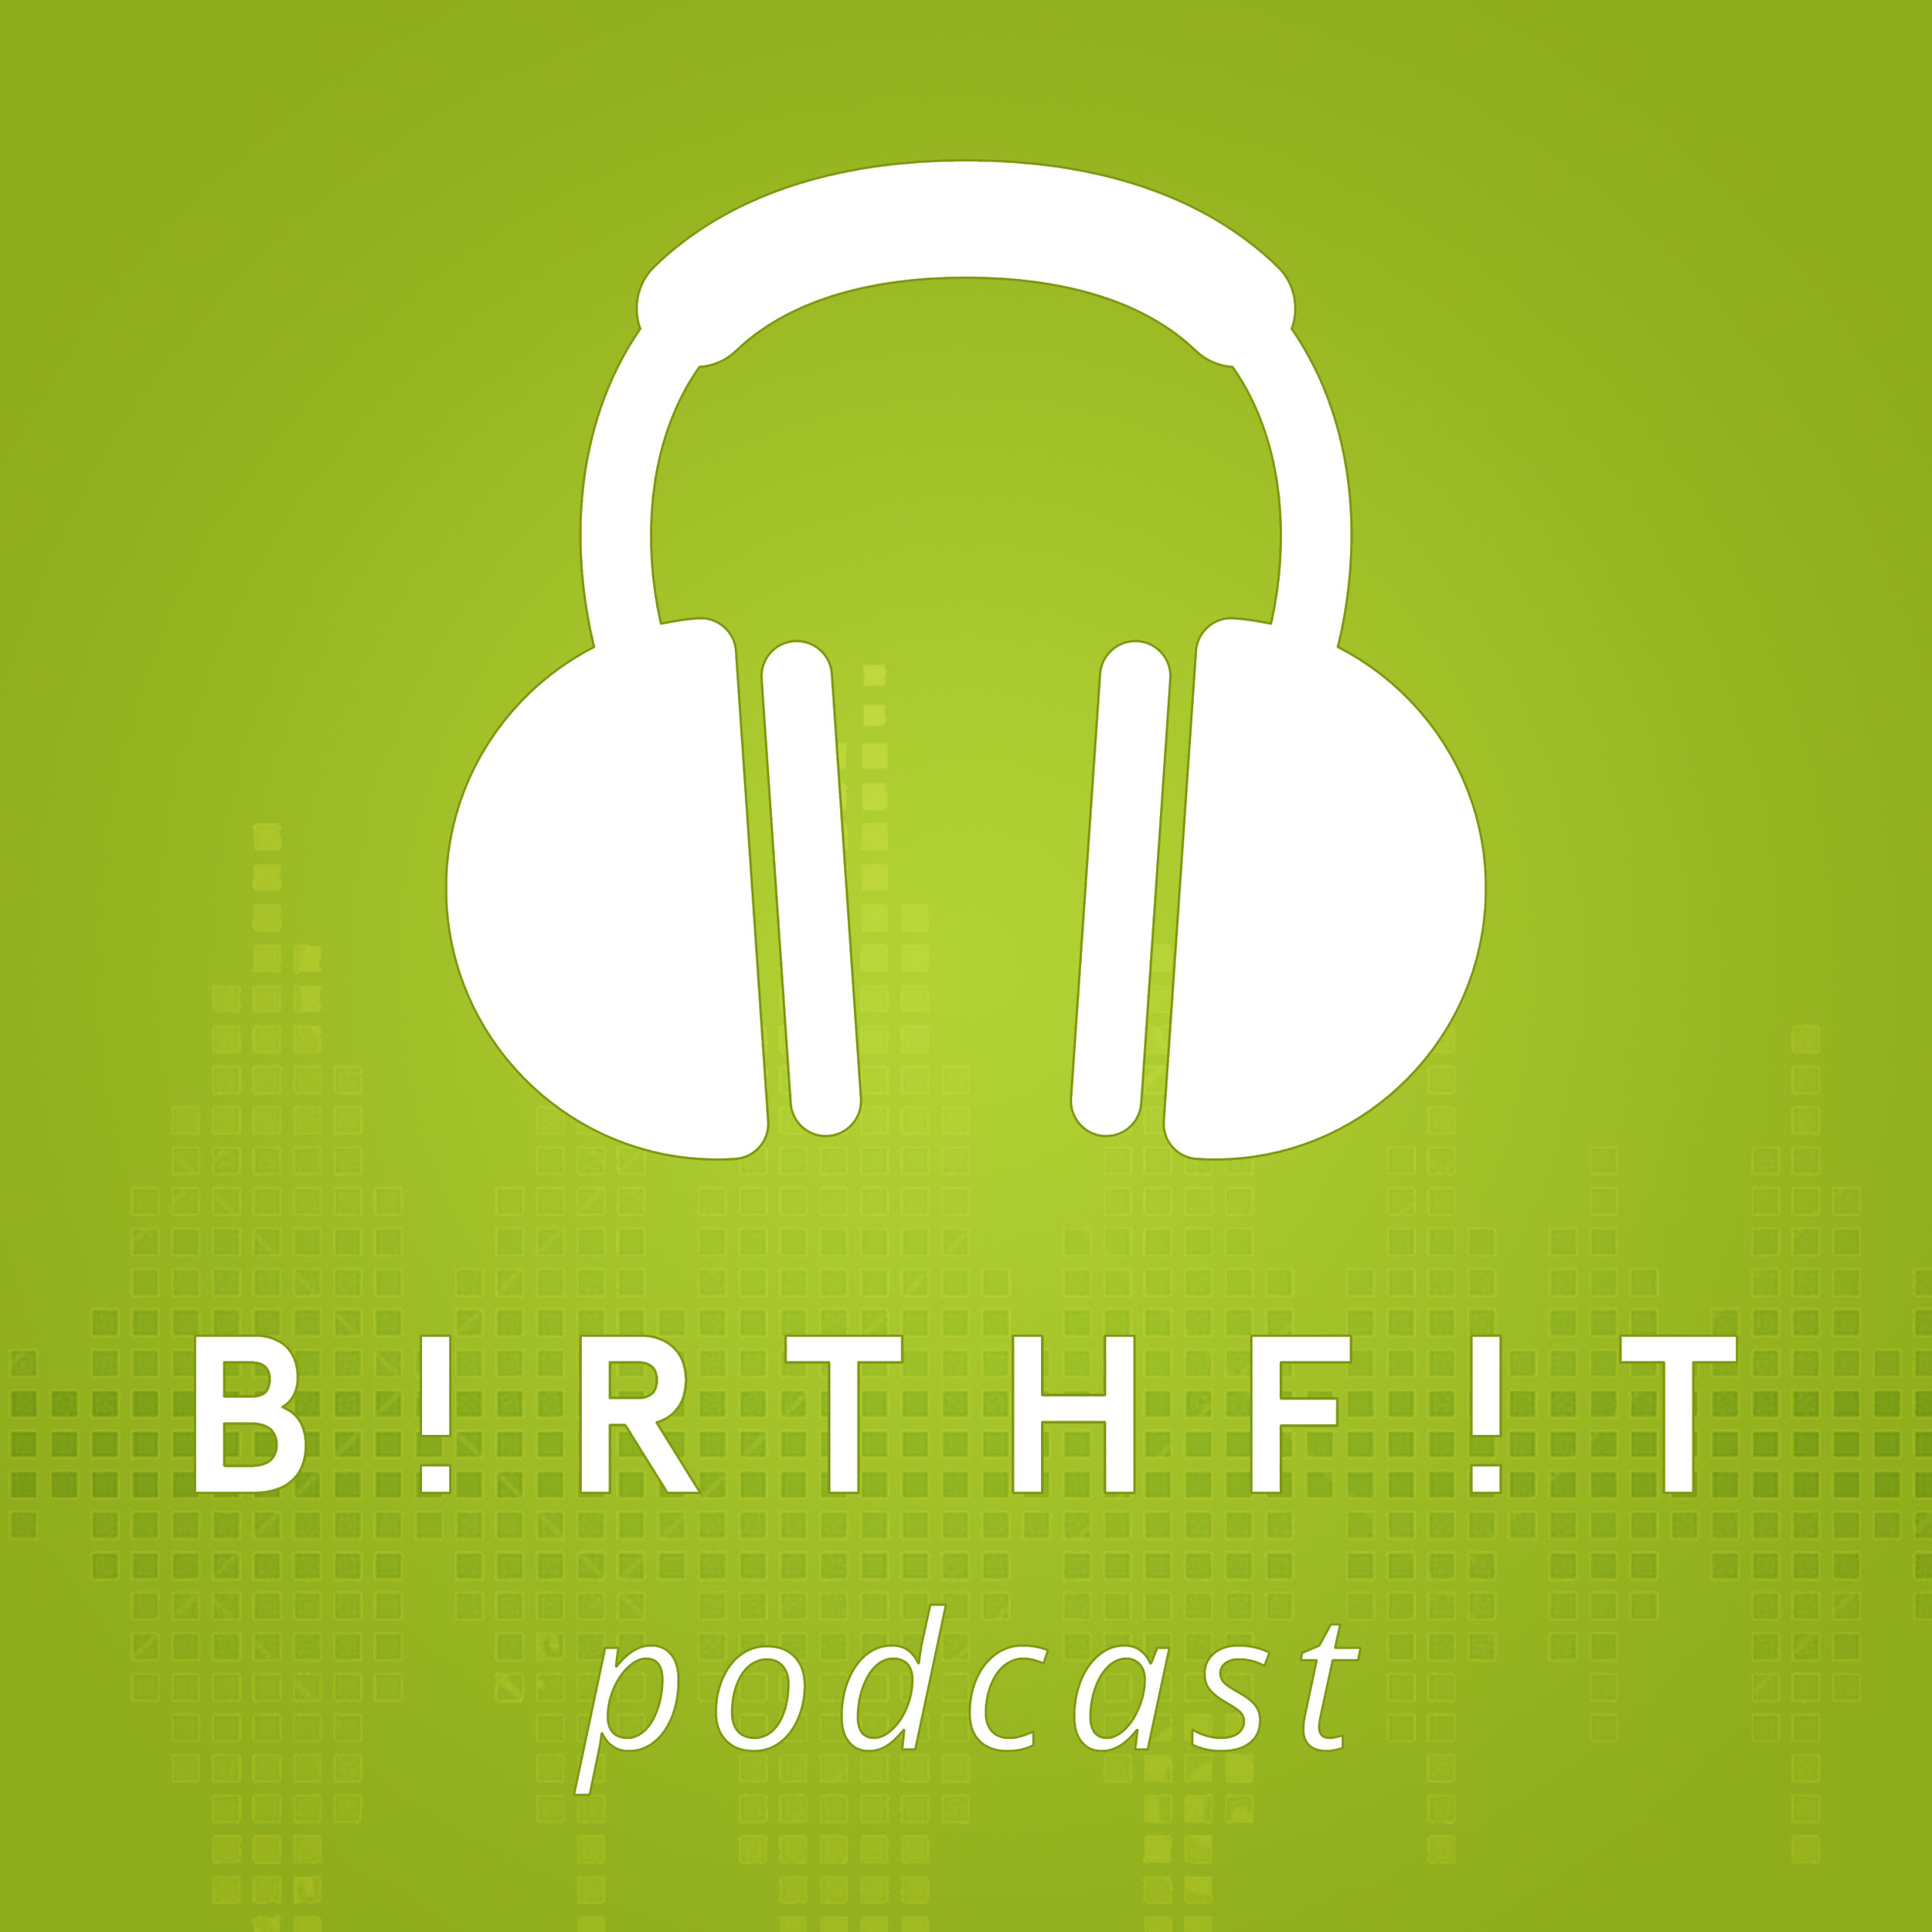 BIRTHFIT Podcast